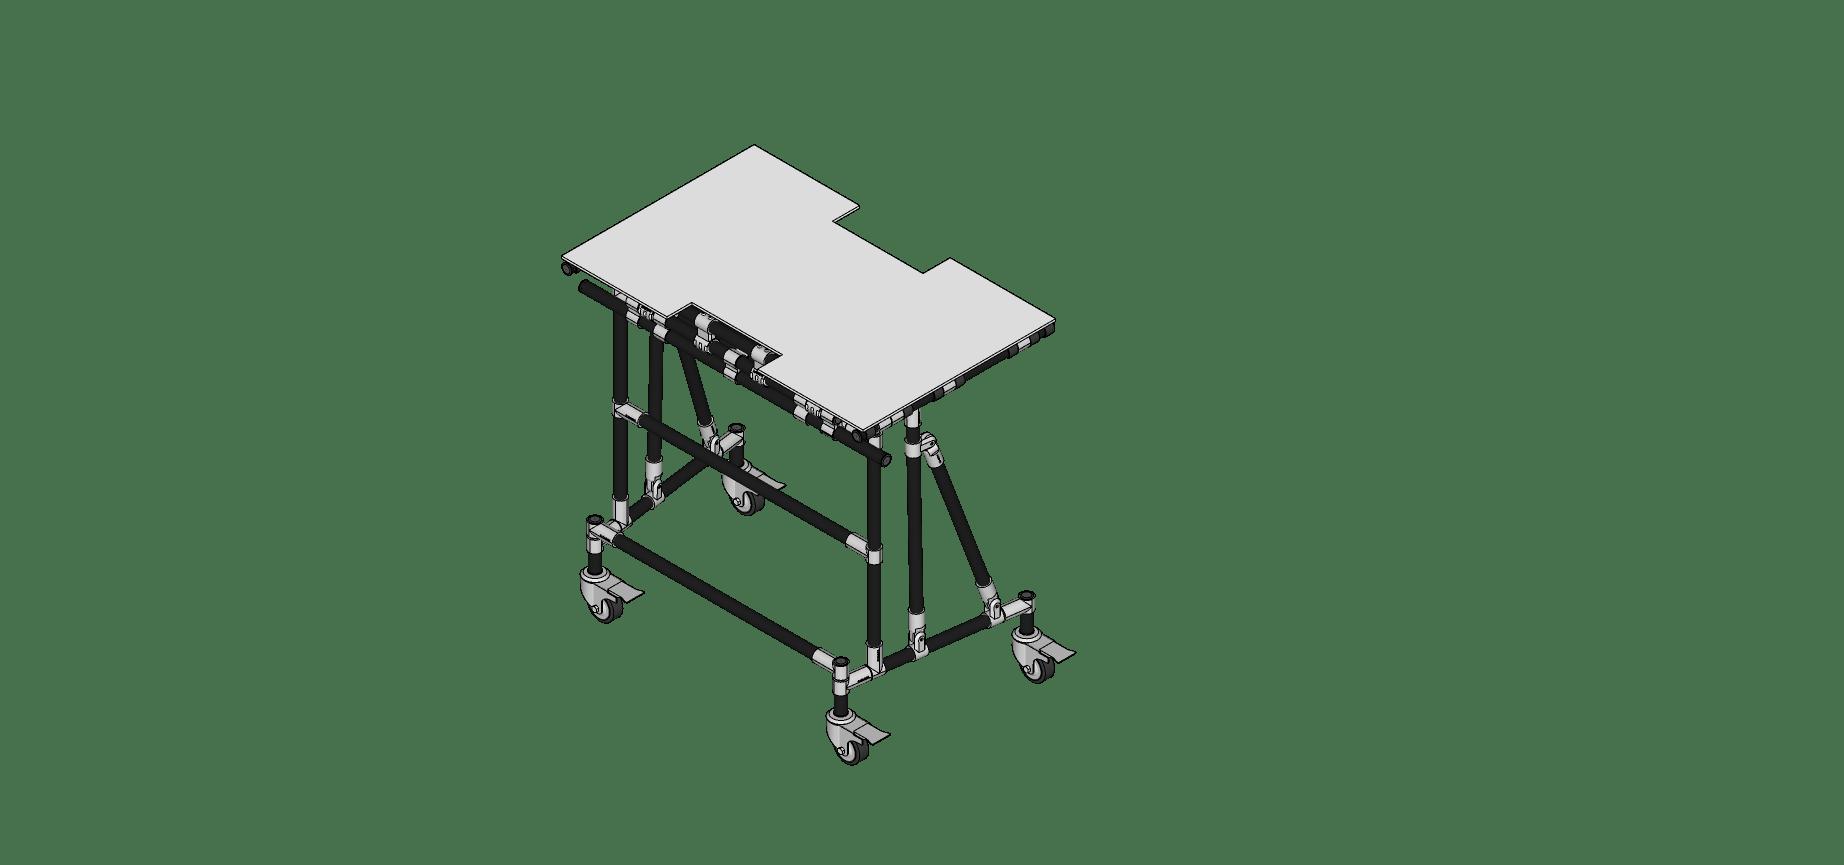 Table Pivotant et Embilable a L'Horizontal